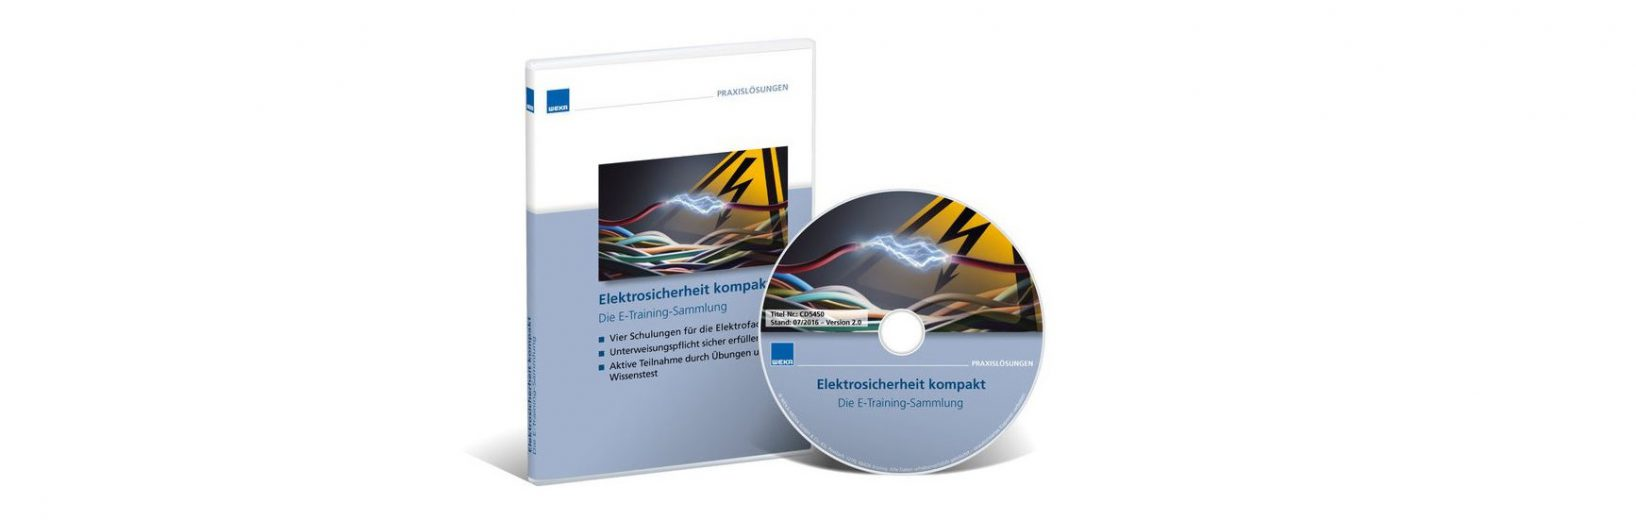 Elektrosicherheit kompakt: Die E-Training-Sammlung